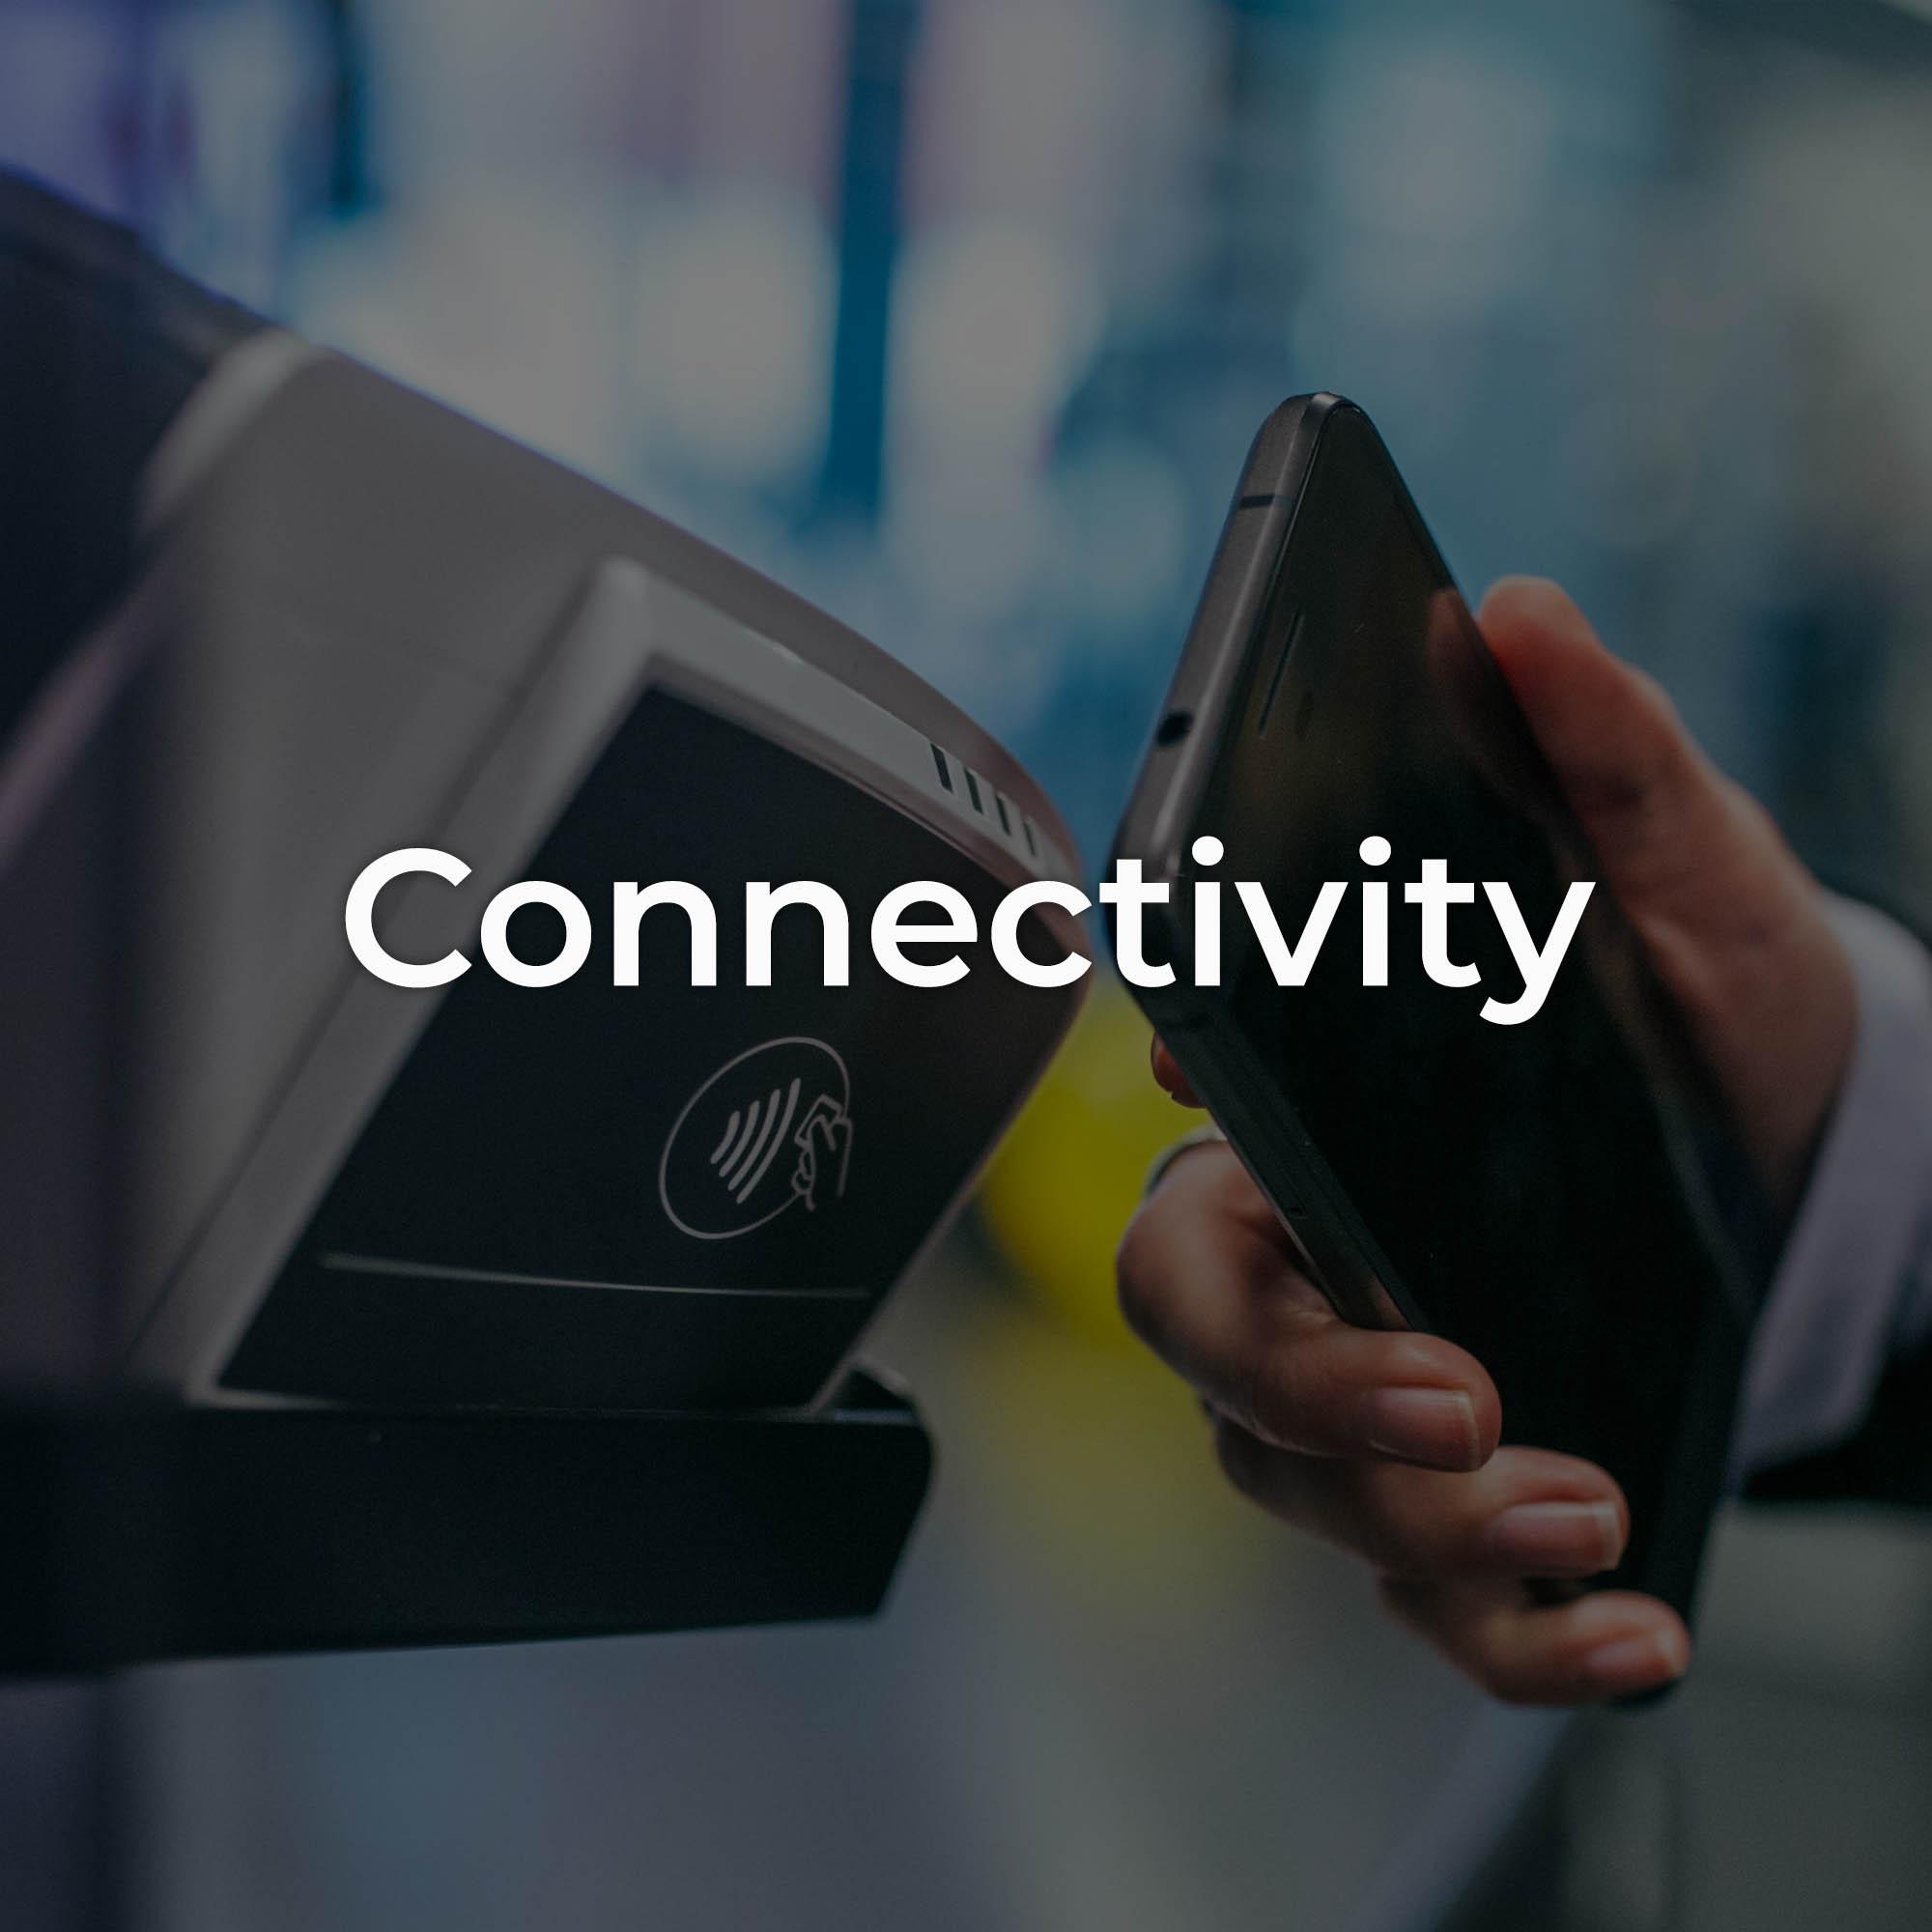 04 Connectivity.jpg